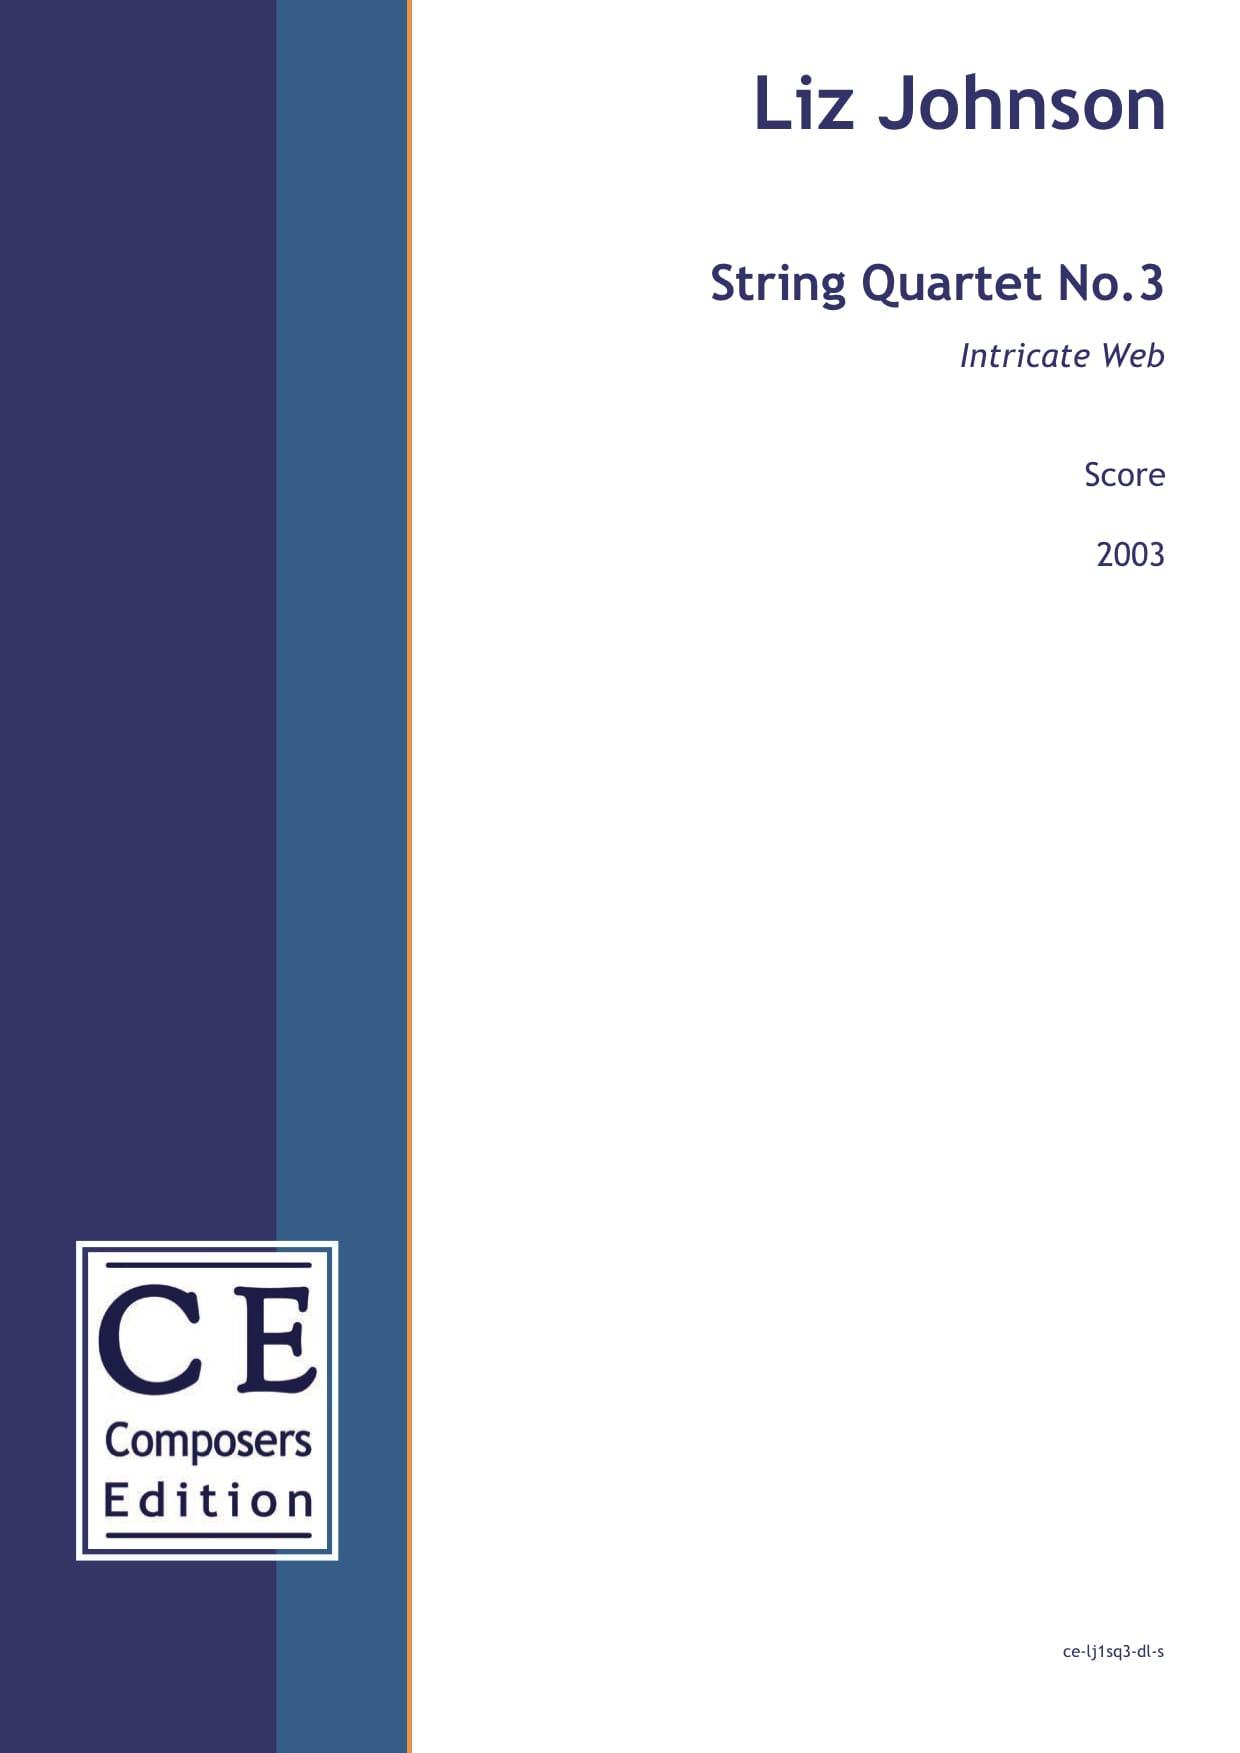 Liz Johnson: String Quartet No.3 Intricate Web